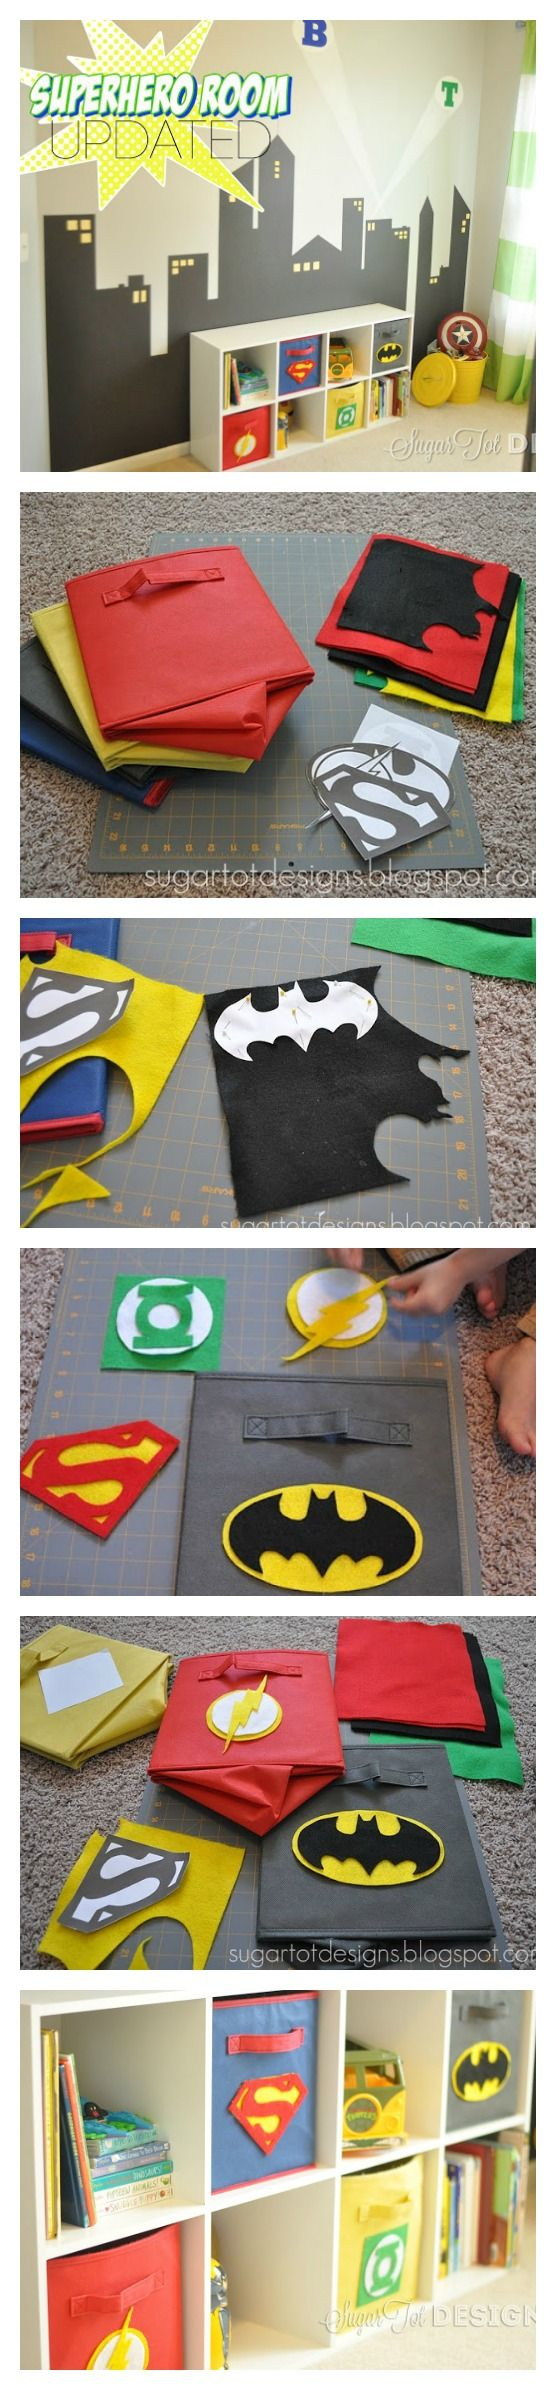 Déco chambre enfant/ado thème super-héros - DIY